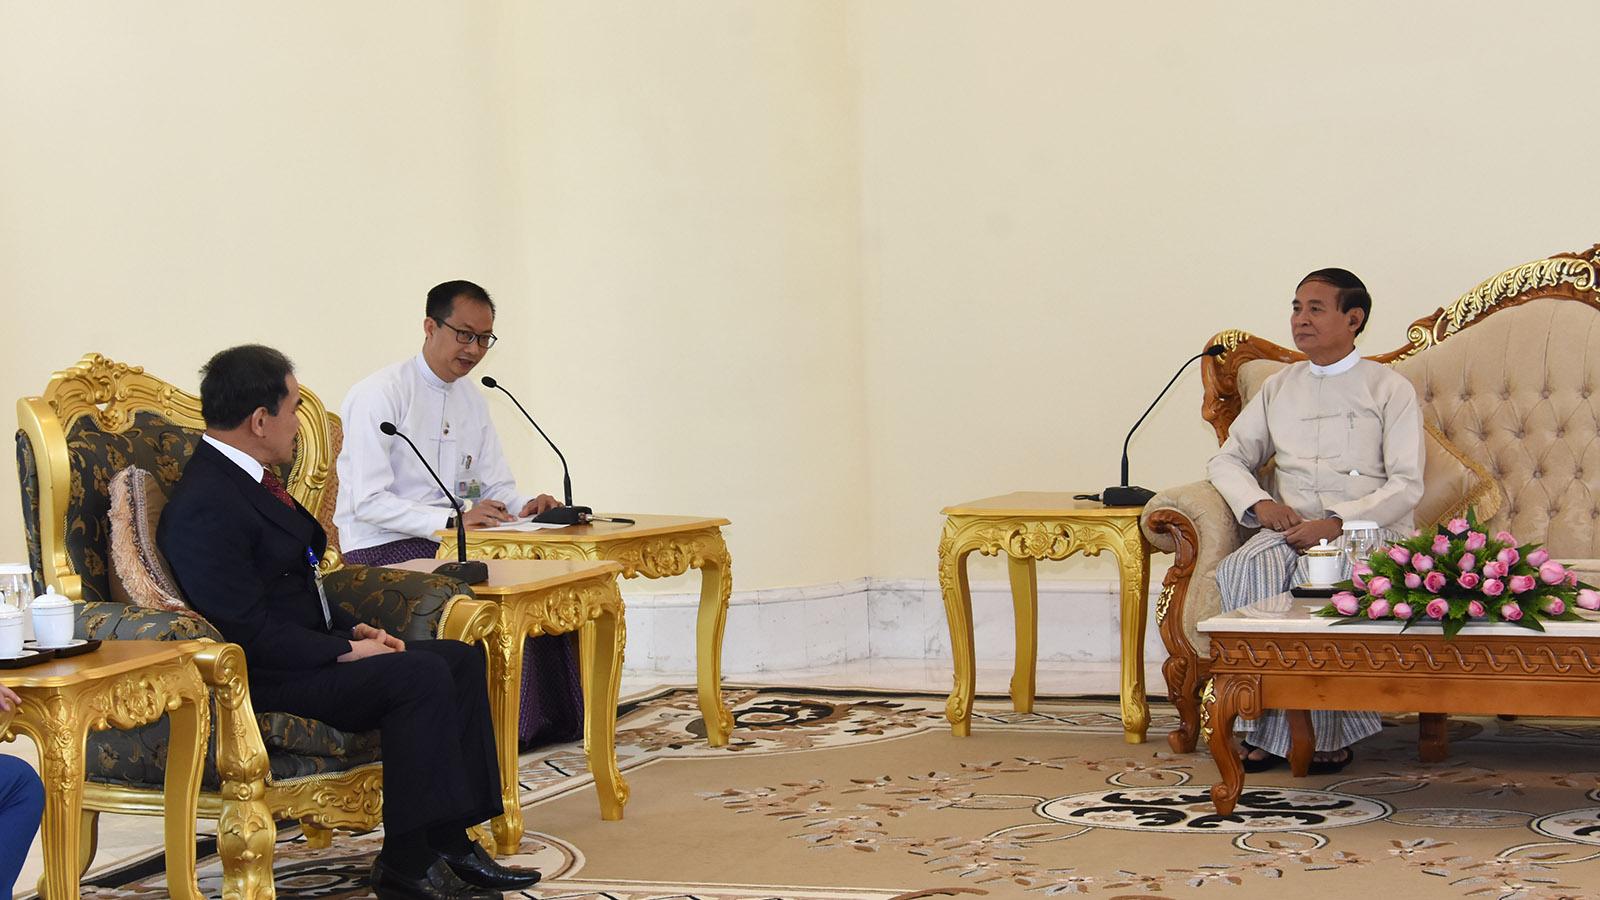 President U Win Myint meets with outgoing Ambassador of Brunei Darussalam Mr Pehin Orang Kaya Seri Pahlawan Colonel (Rtd) Dato Paduka Haji Abdu'r Rahmani bin Dato Paduka Haji Basir at the Presidential Palace in Nay Pyi Taw yesterday.Photo: MNA